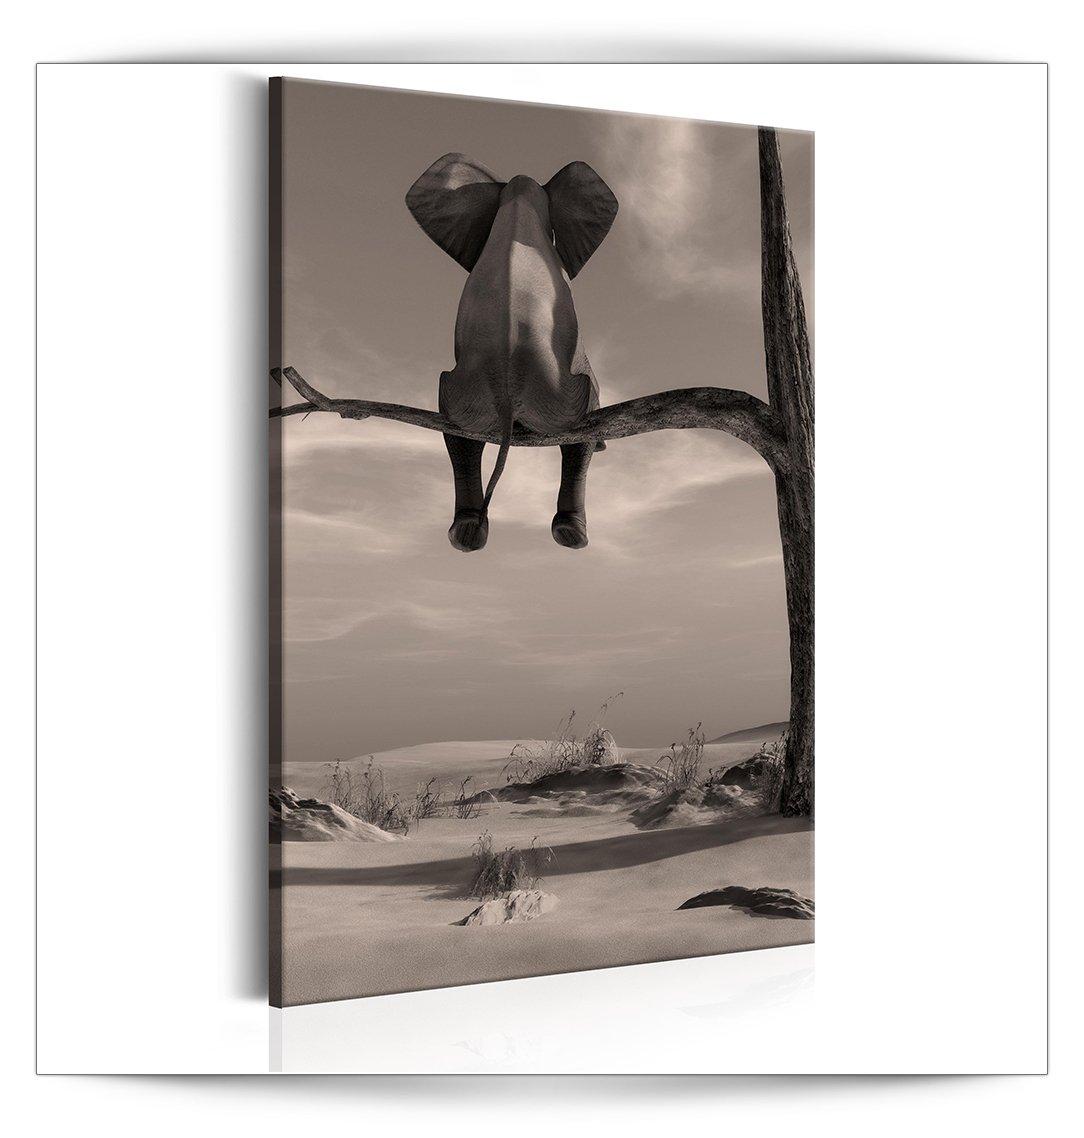 Decomonkey Akustikbild Elefant 60x90 cm 1 Teilig Bilder Leinwandbilder Wandbilder XXL Schallschlucker Schallschutz Akustikdämmung Wandbild Deko leise Landschaft Natur Tiere